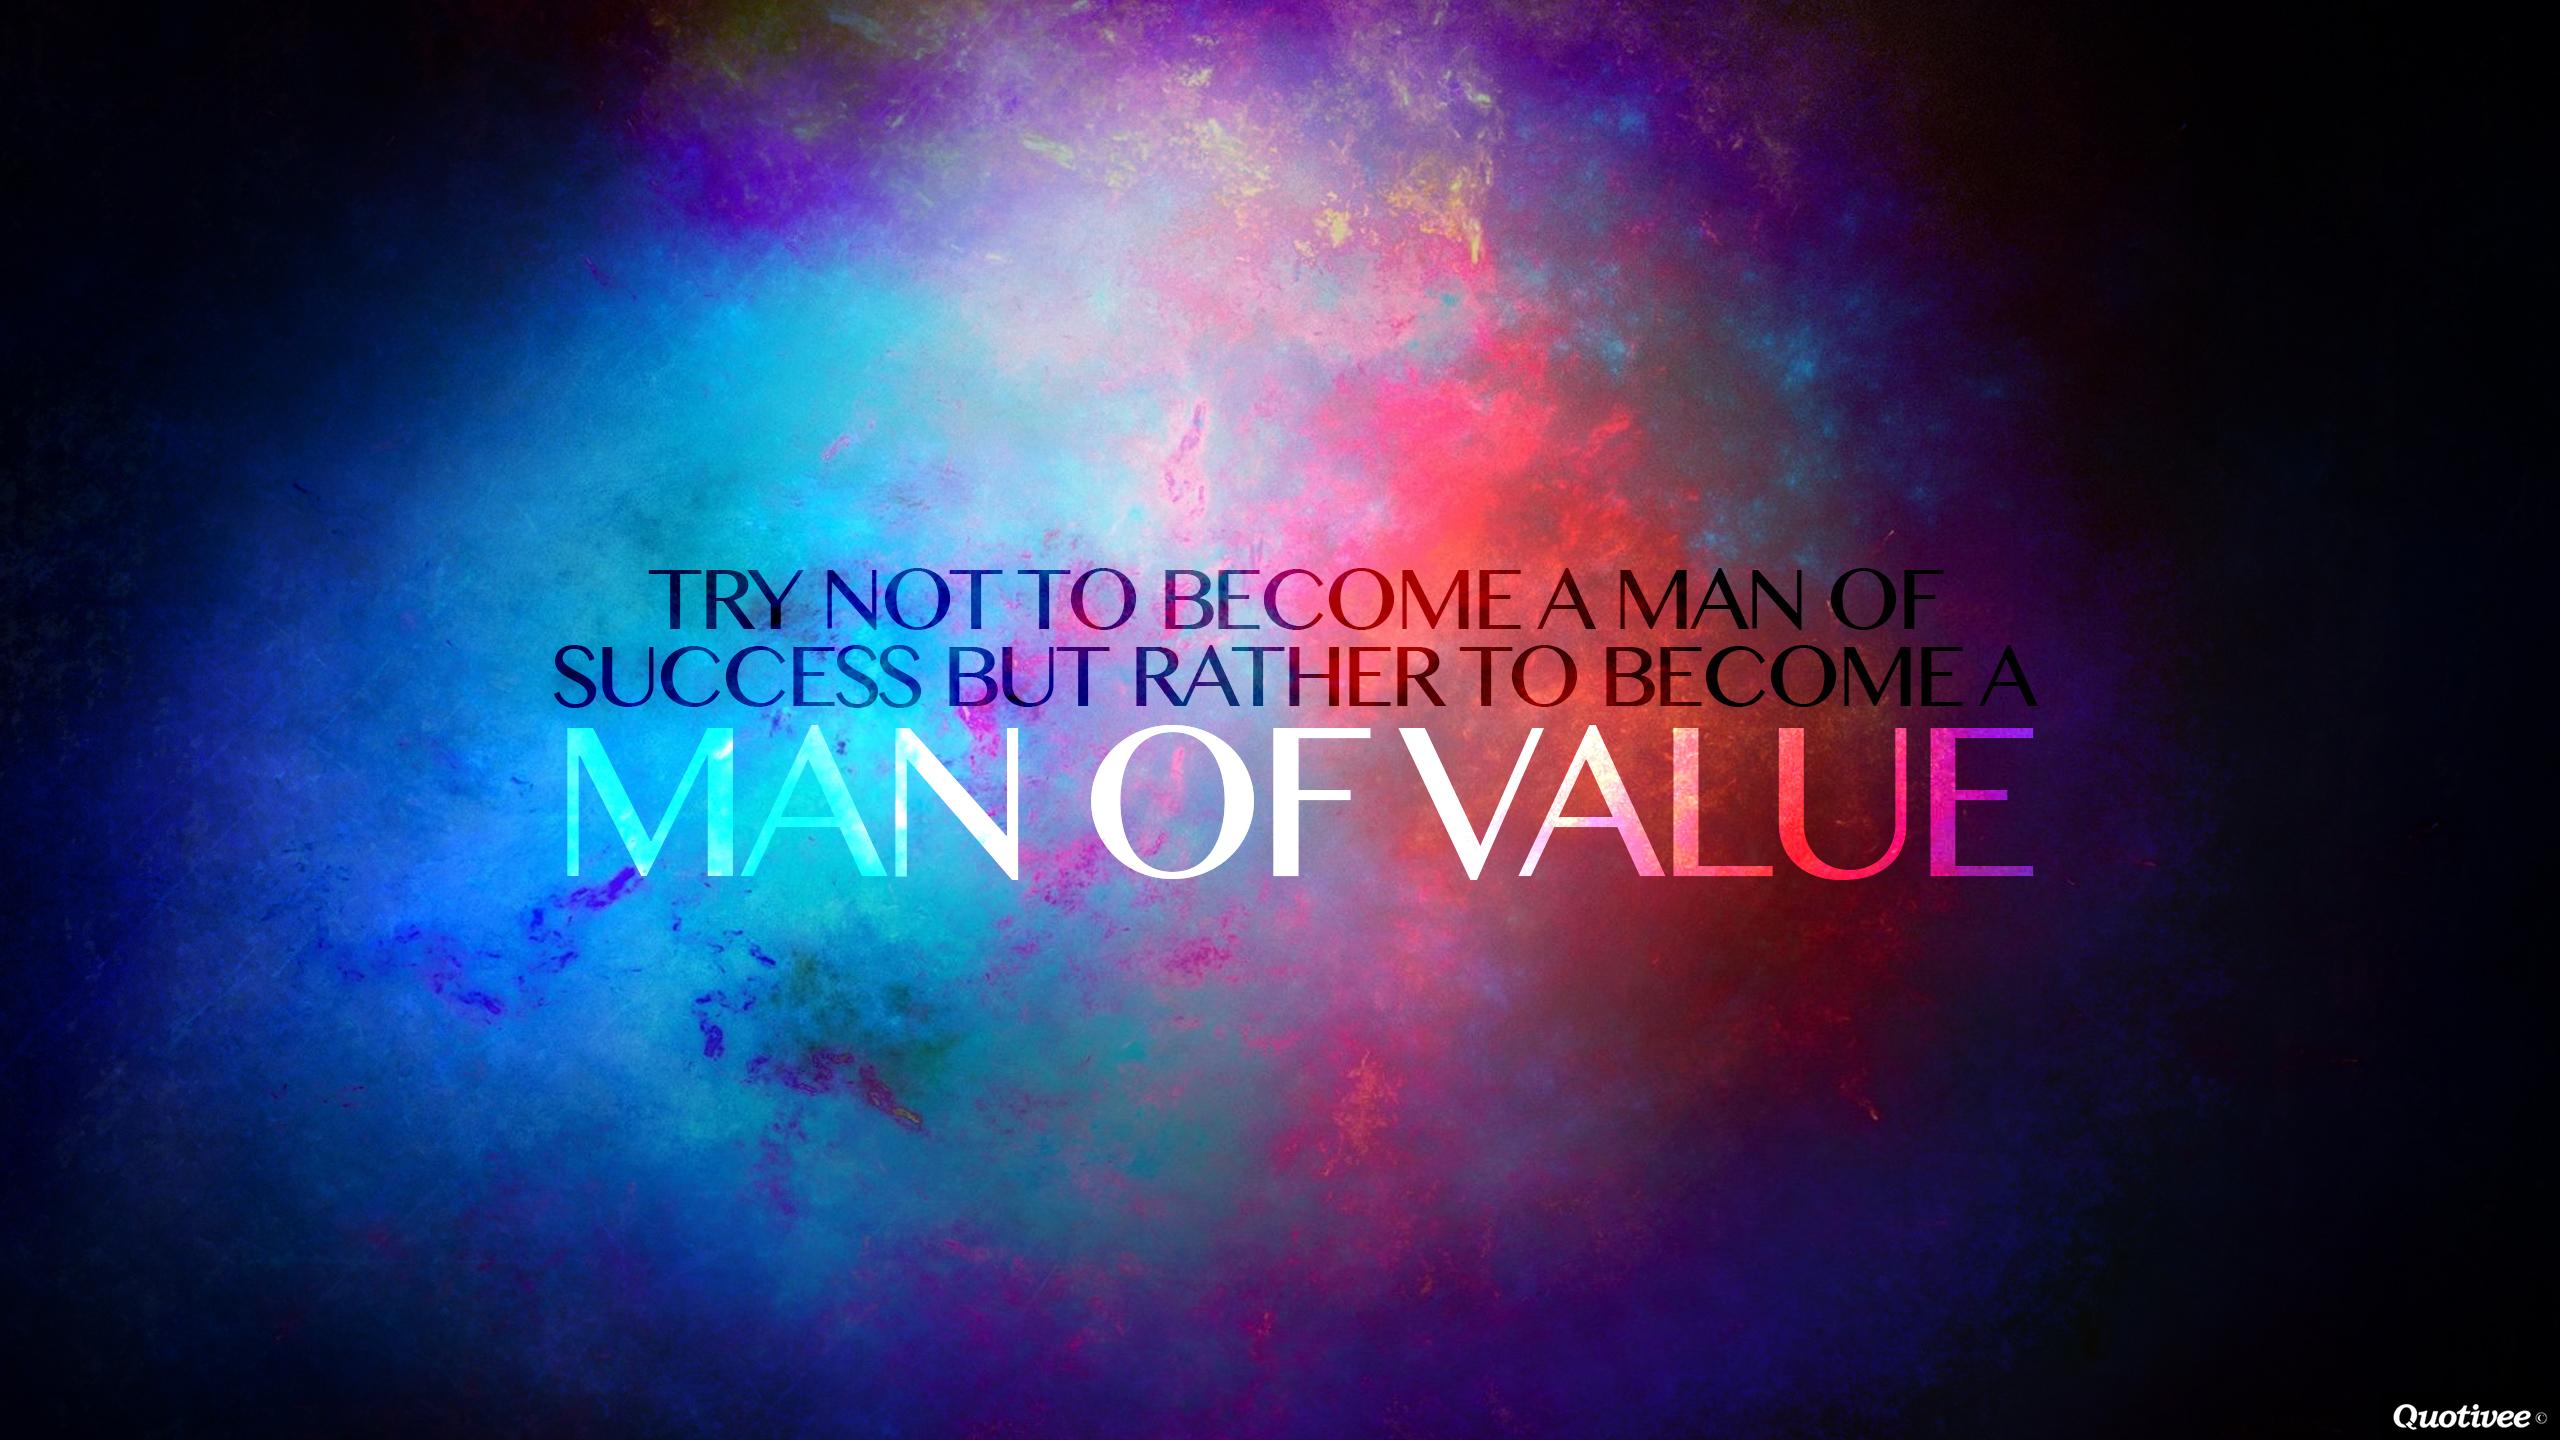 Man of Value   Inspirational Quotes Quotivee 2560x1440